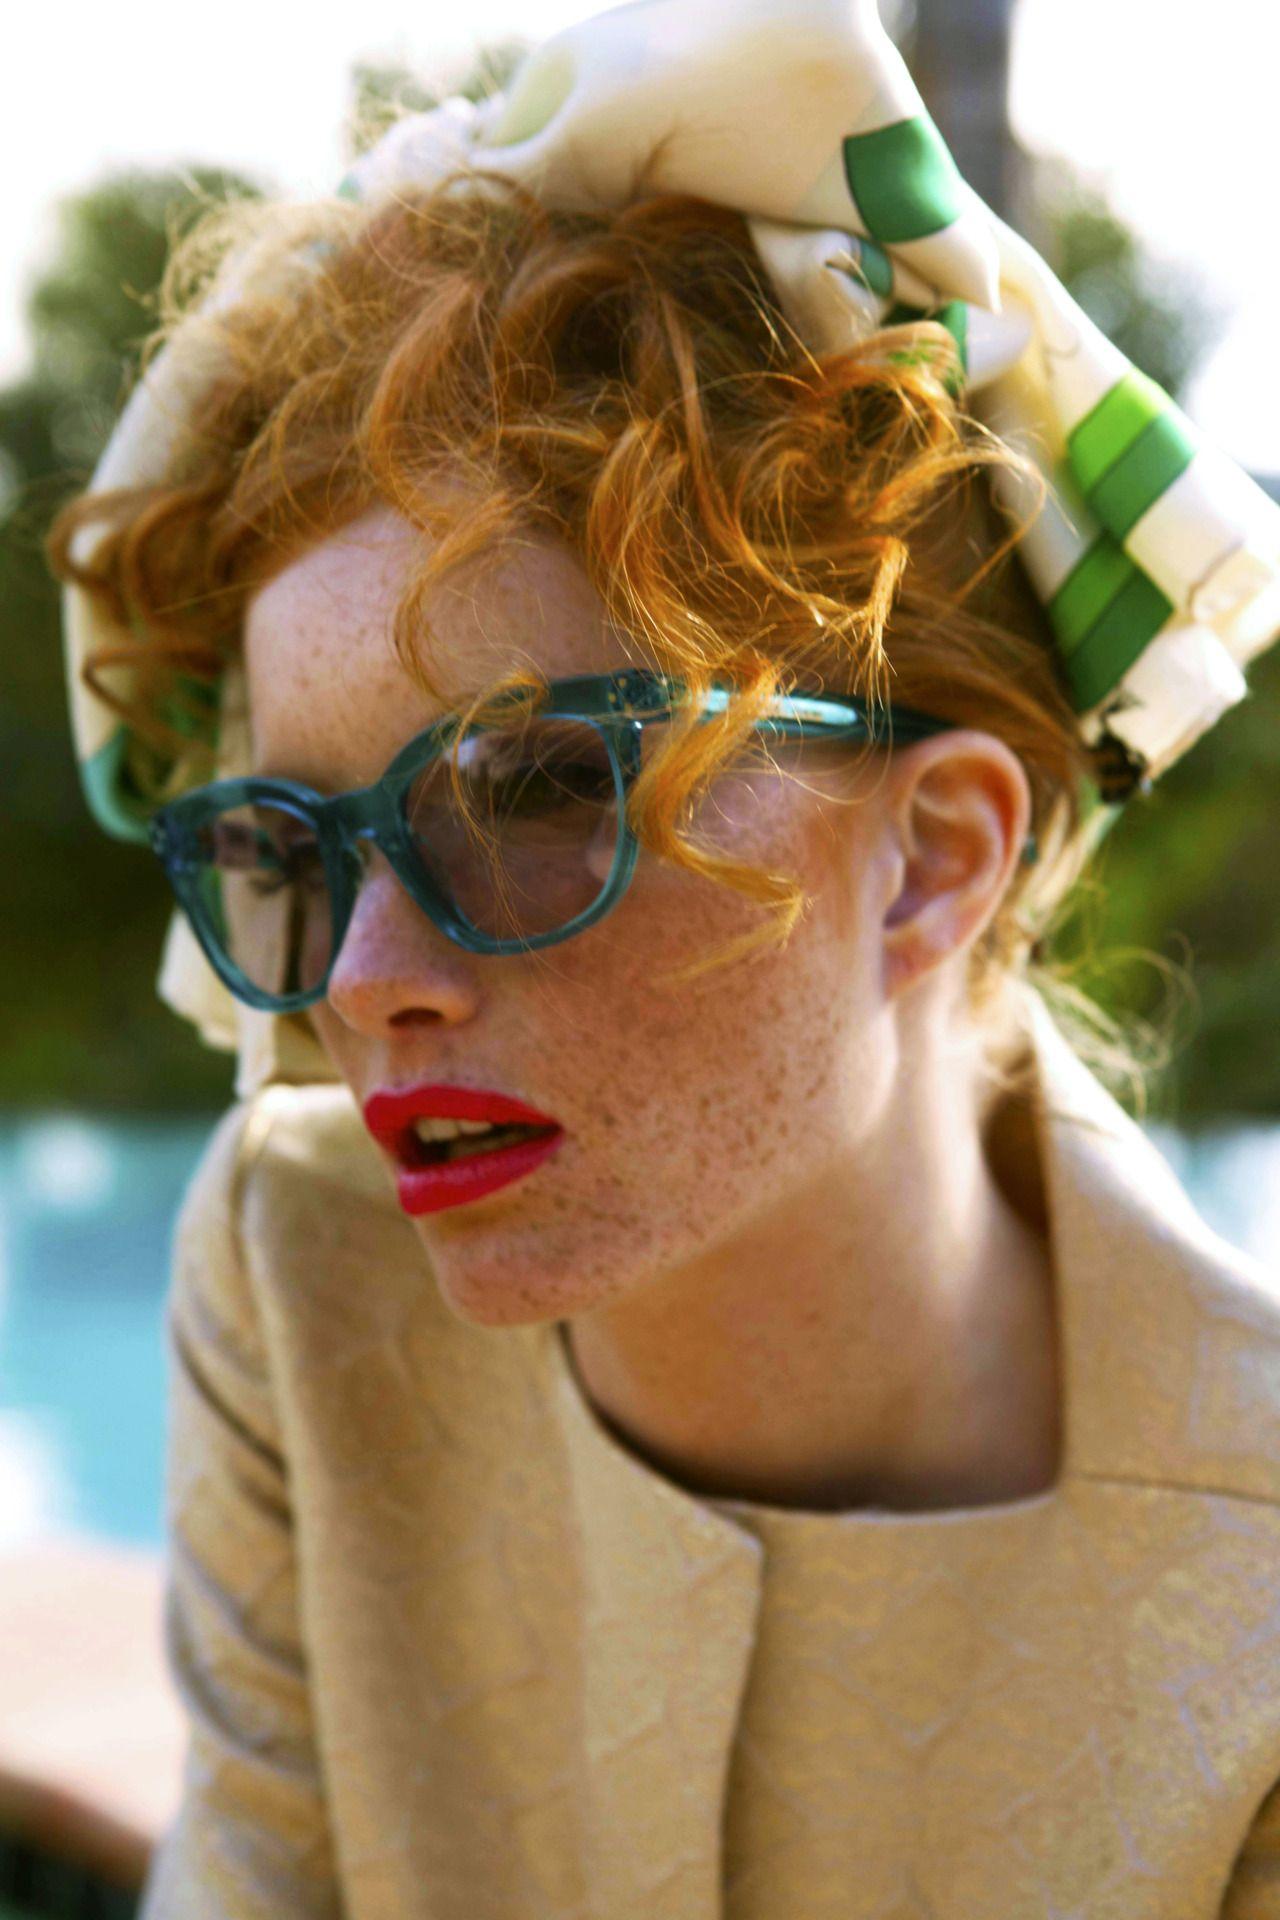 Green frames sunglasses